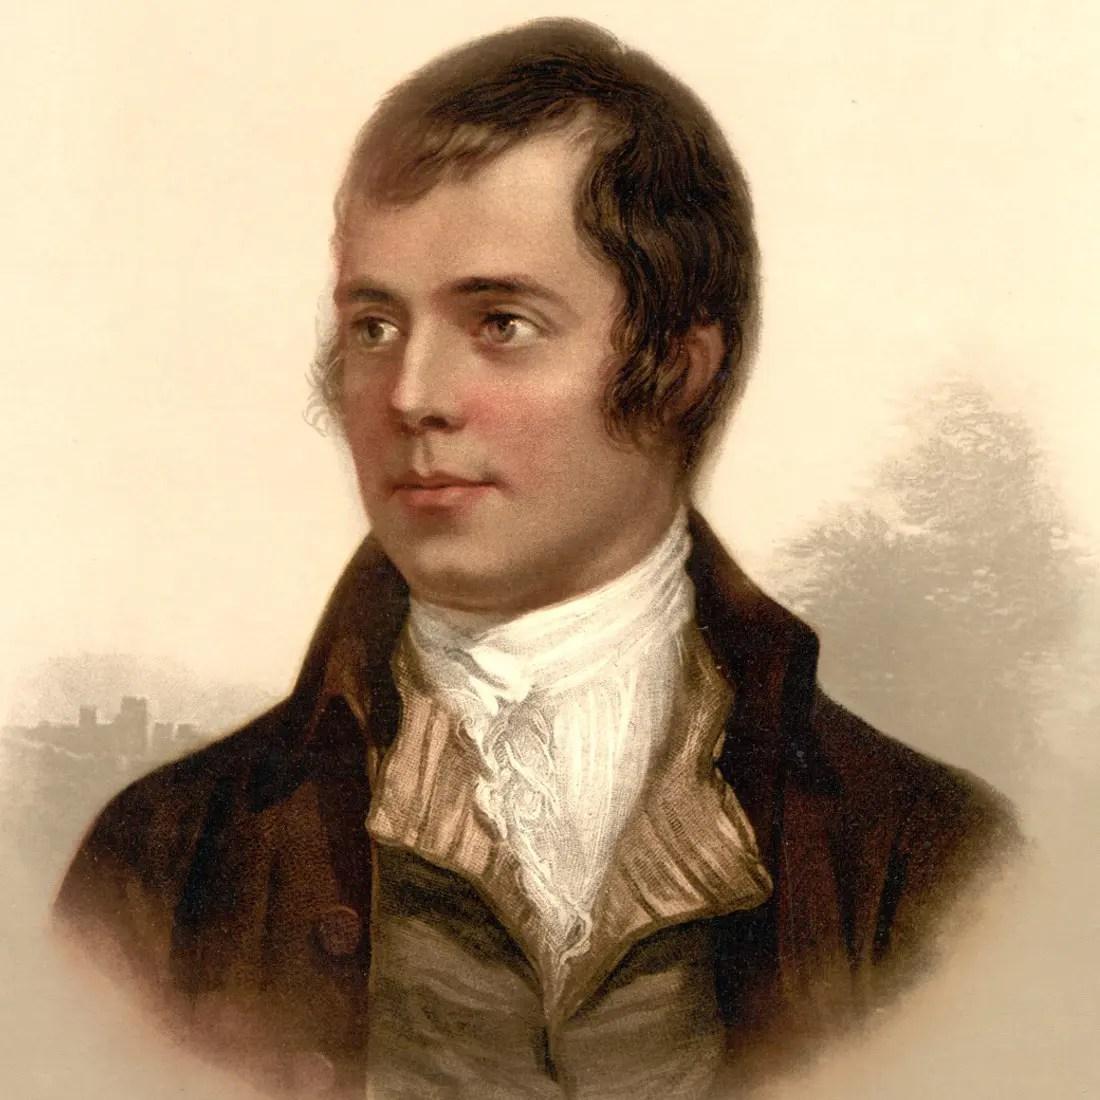 portrait_of_robert_burns_ayr_scotland